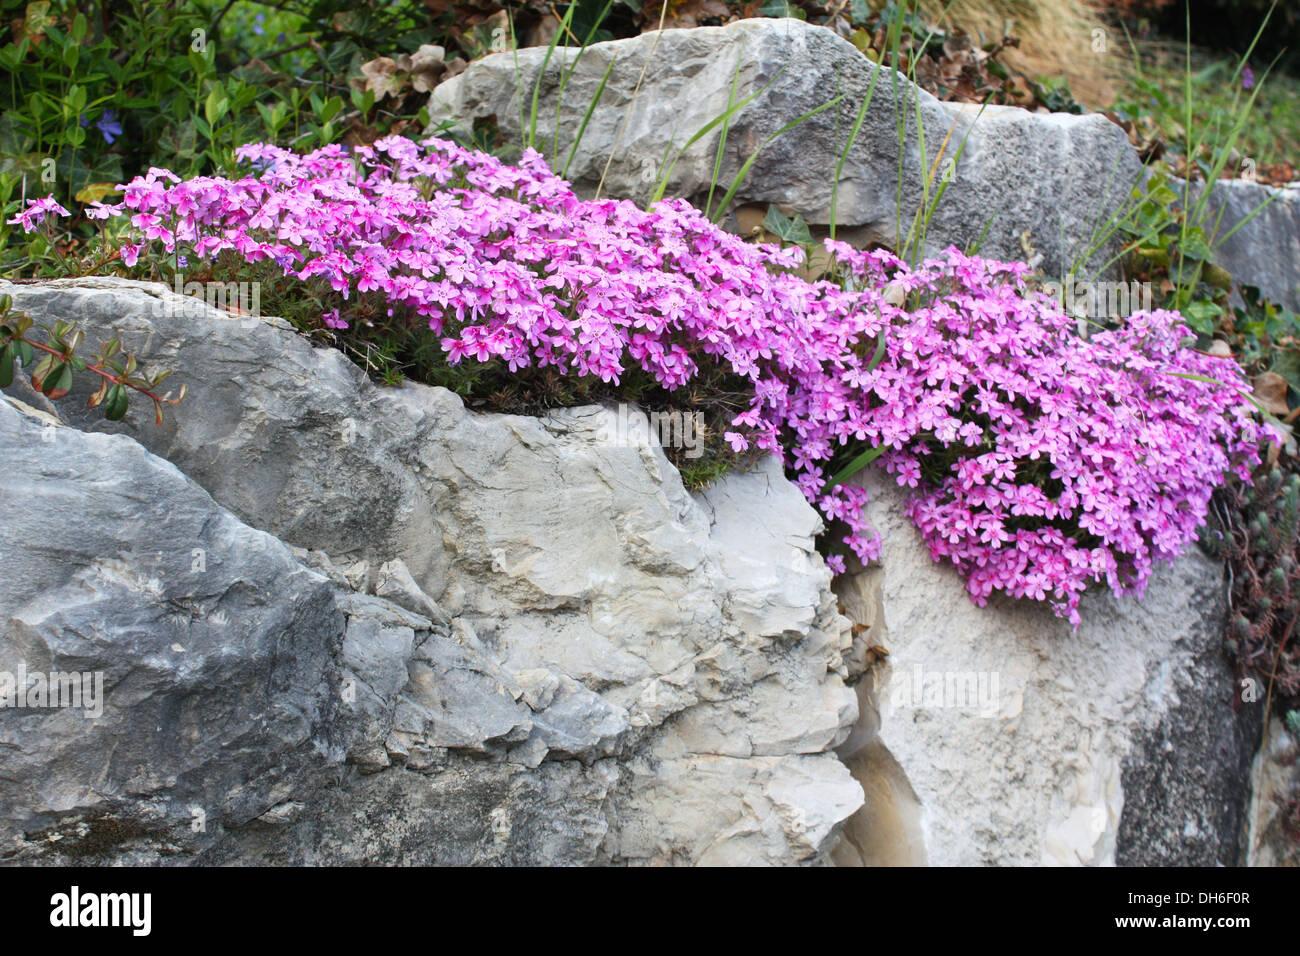 Flowering plants between stone rocks Stock Photo